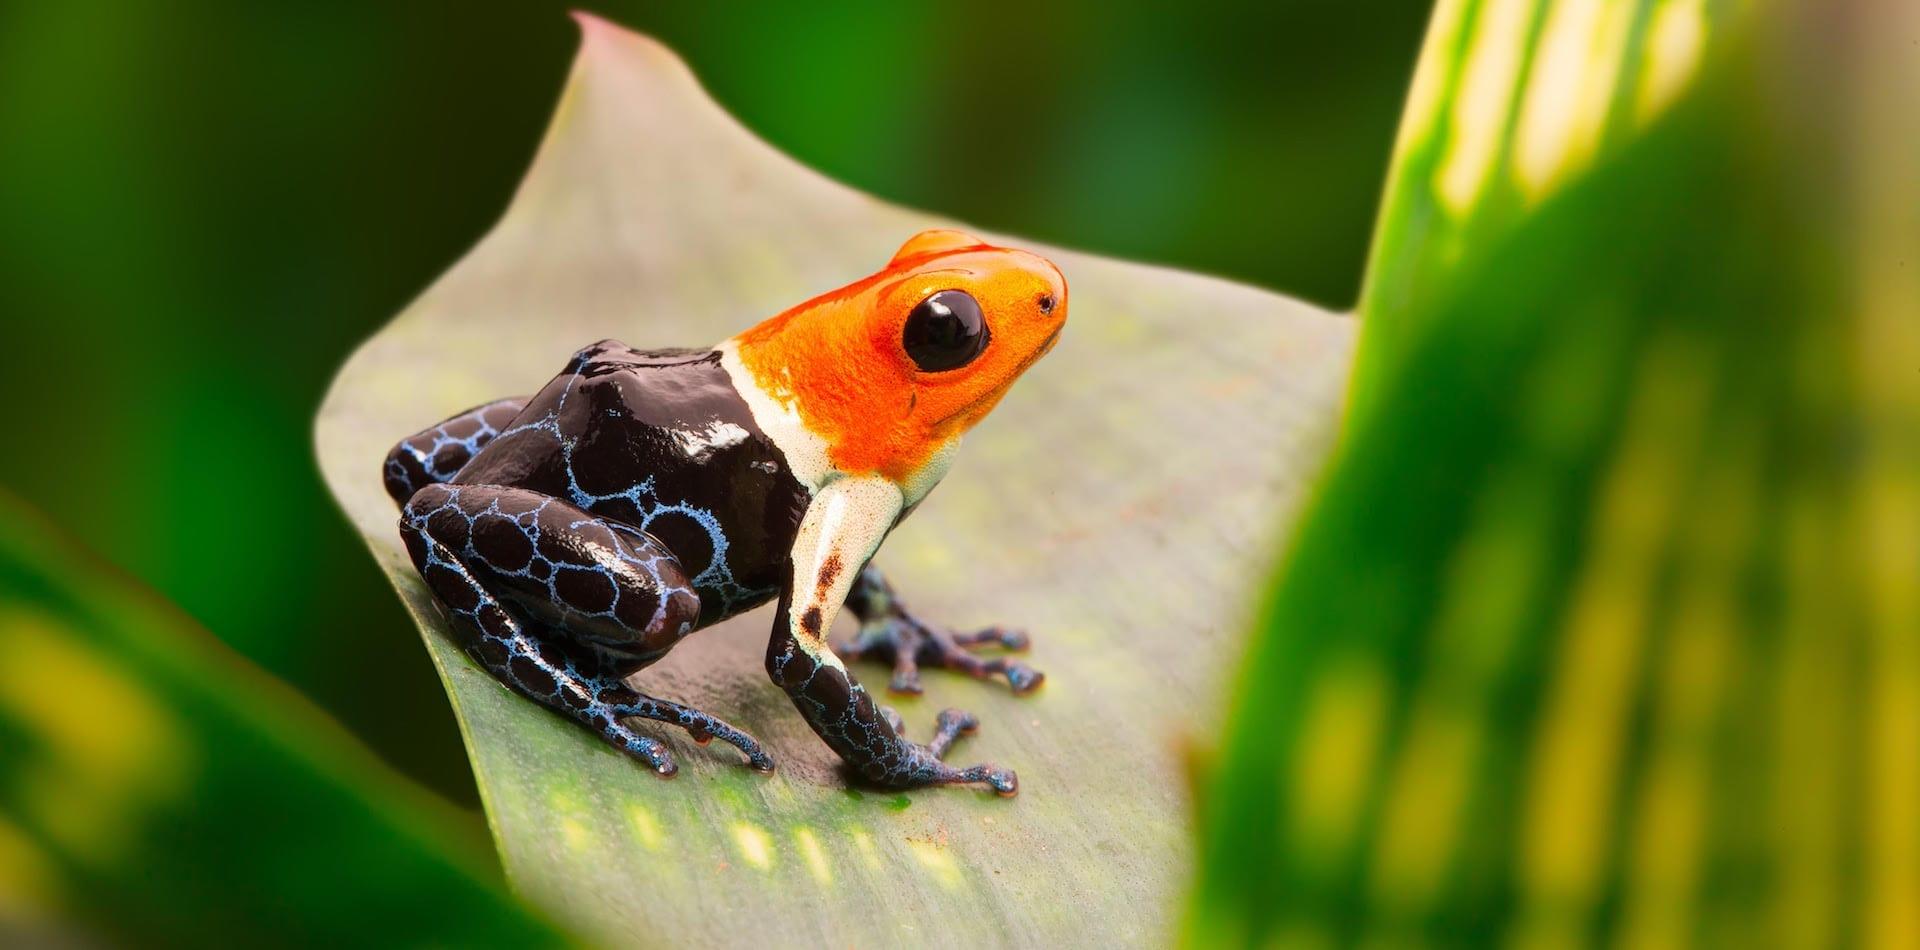 Hero Image Poison Dart Frog in the Peruvian Amazon